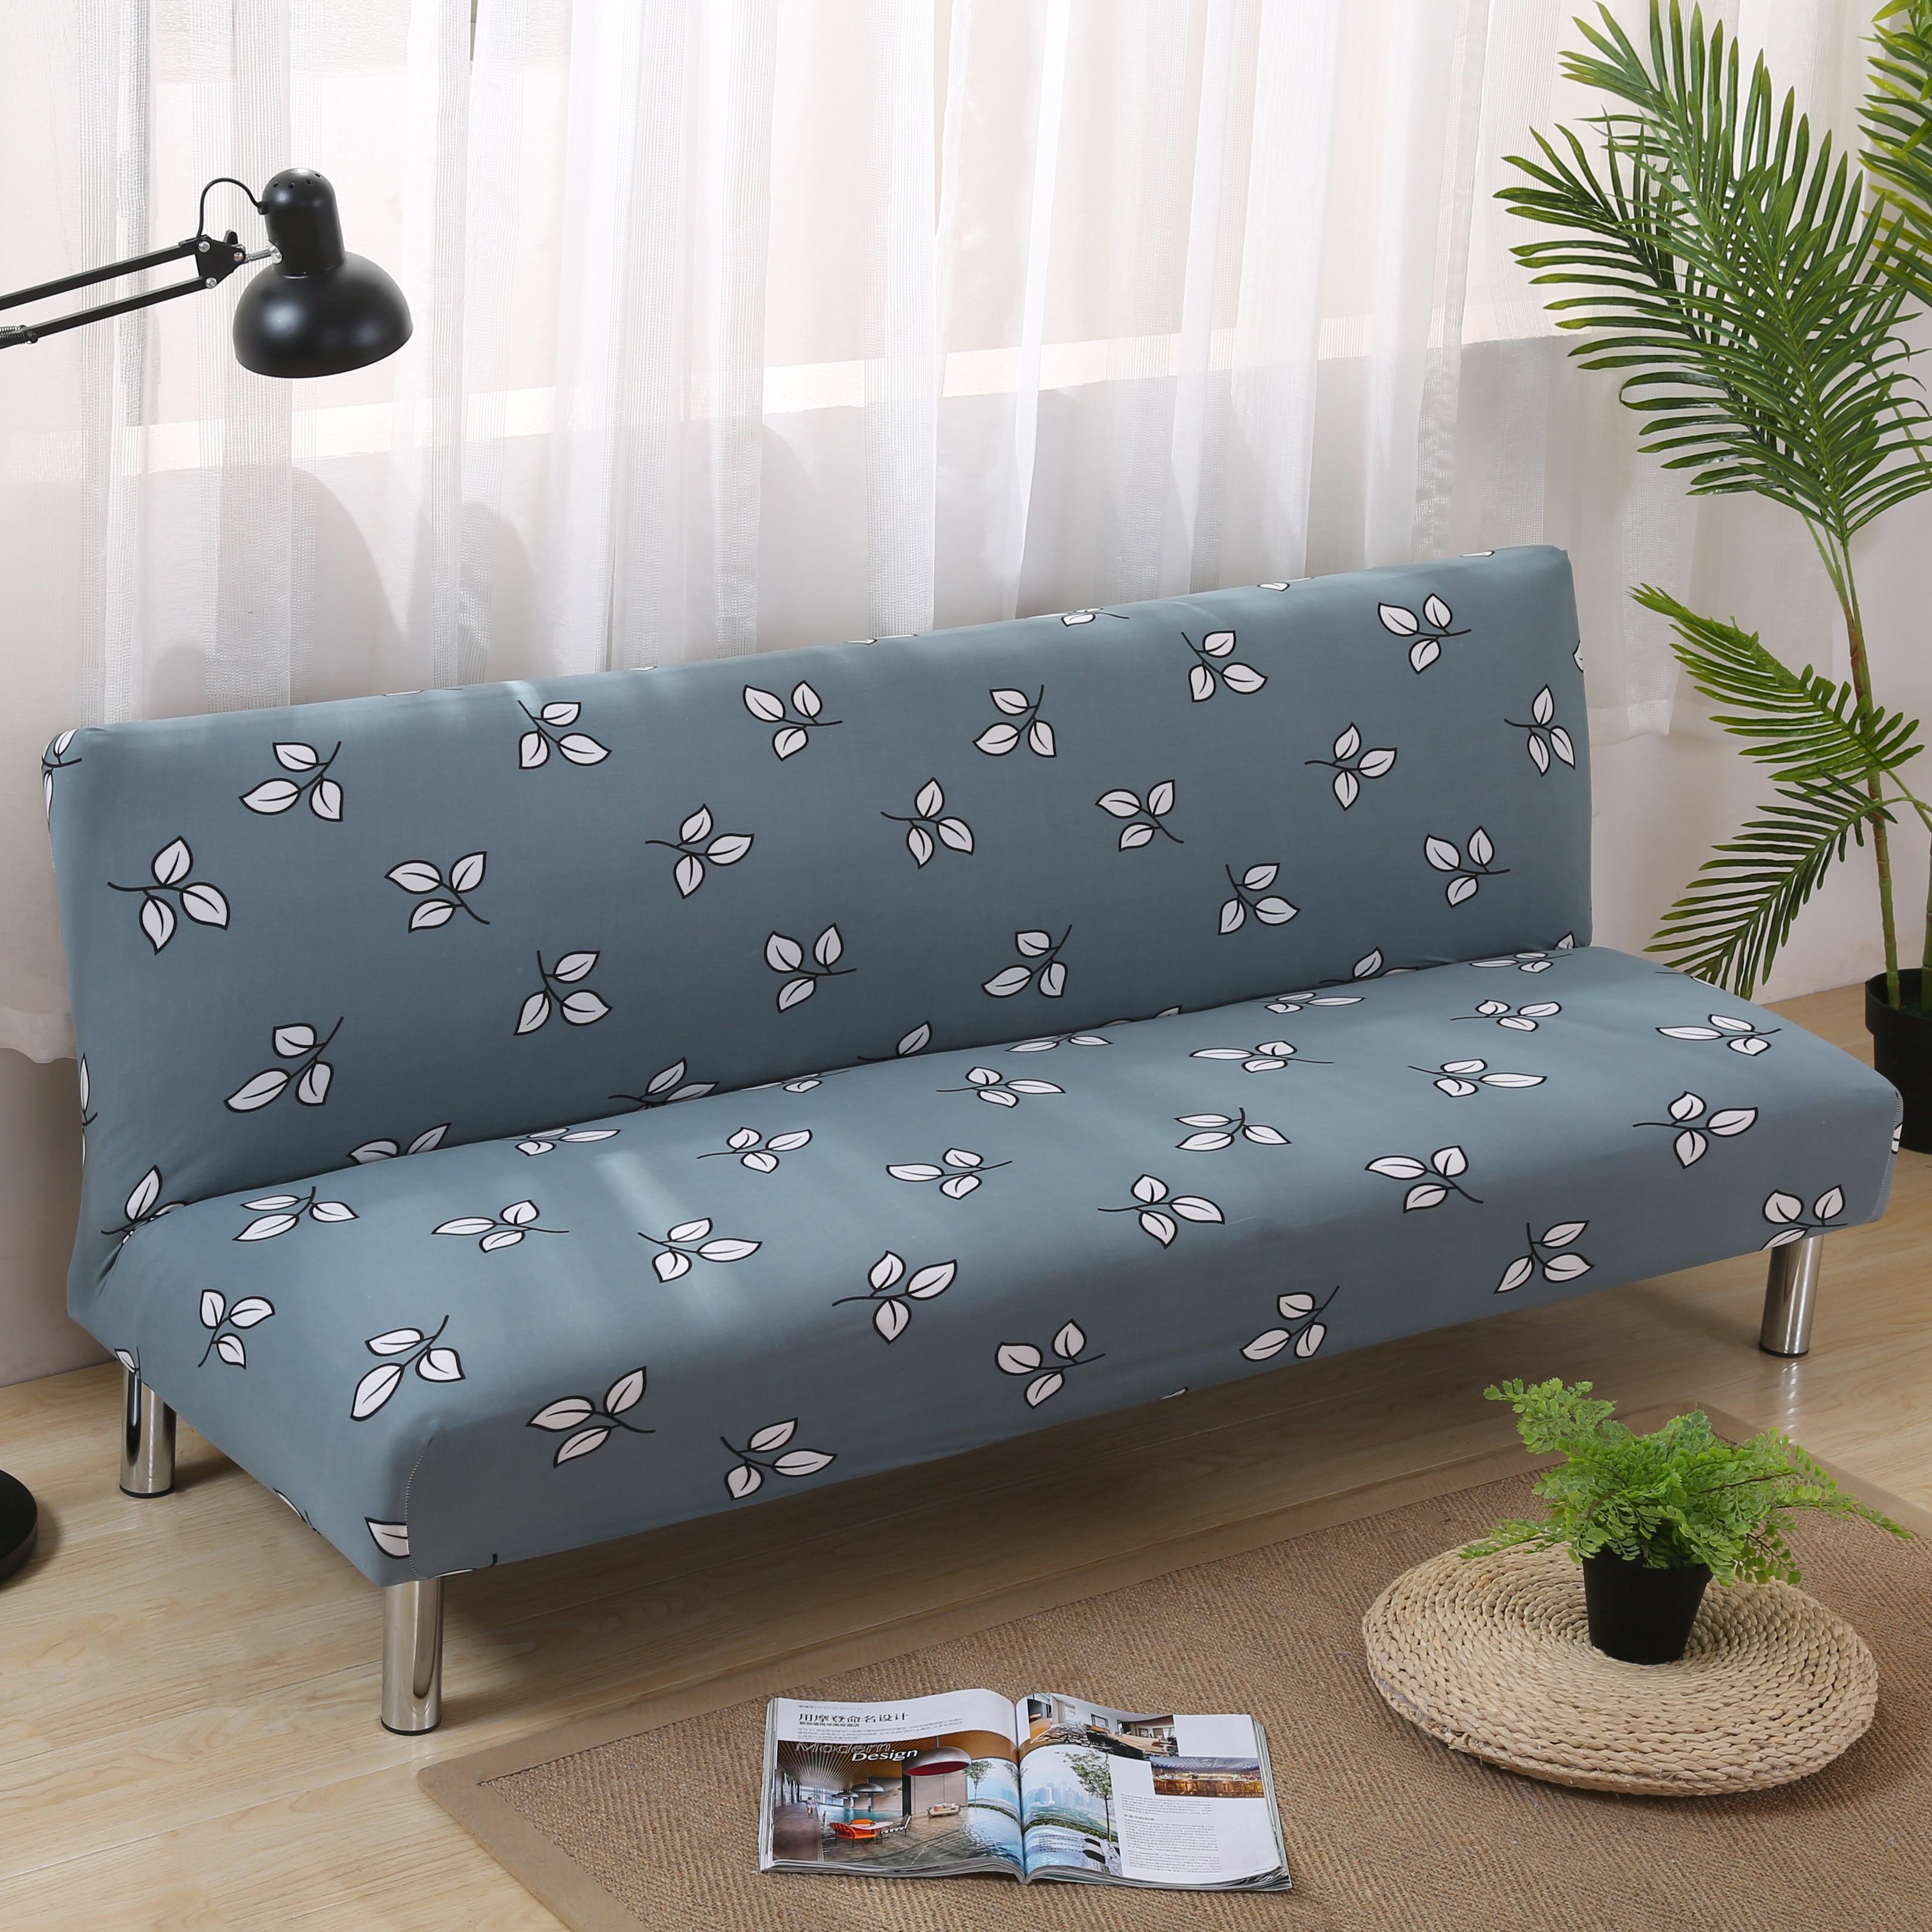 Stretch Sofa Covers Elastic No Handrail Folding Sofa Bed Cover